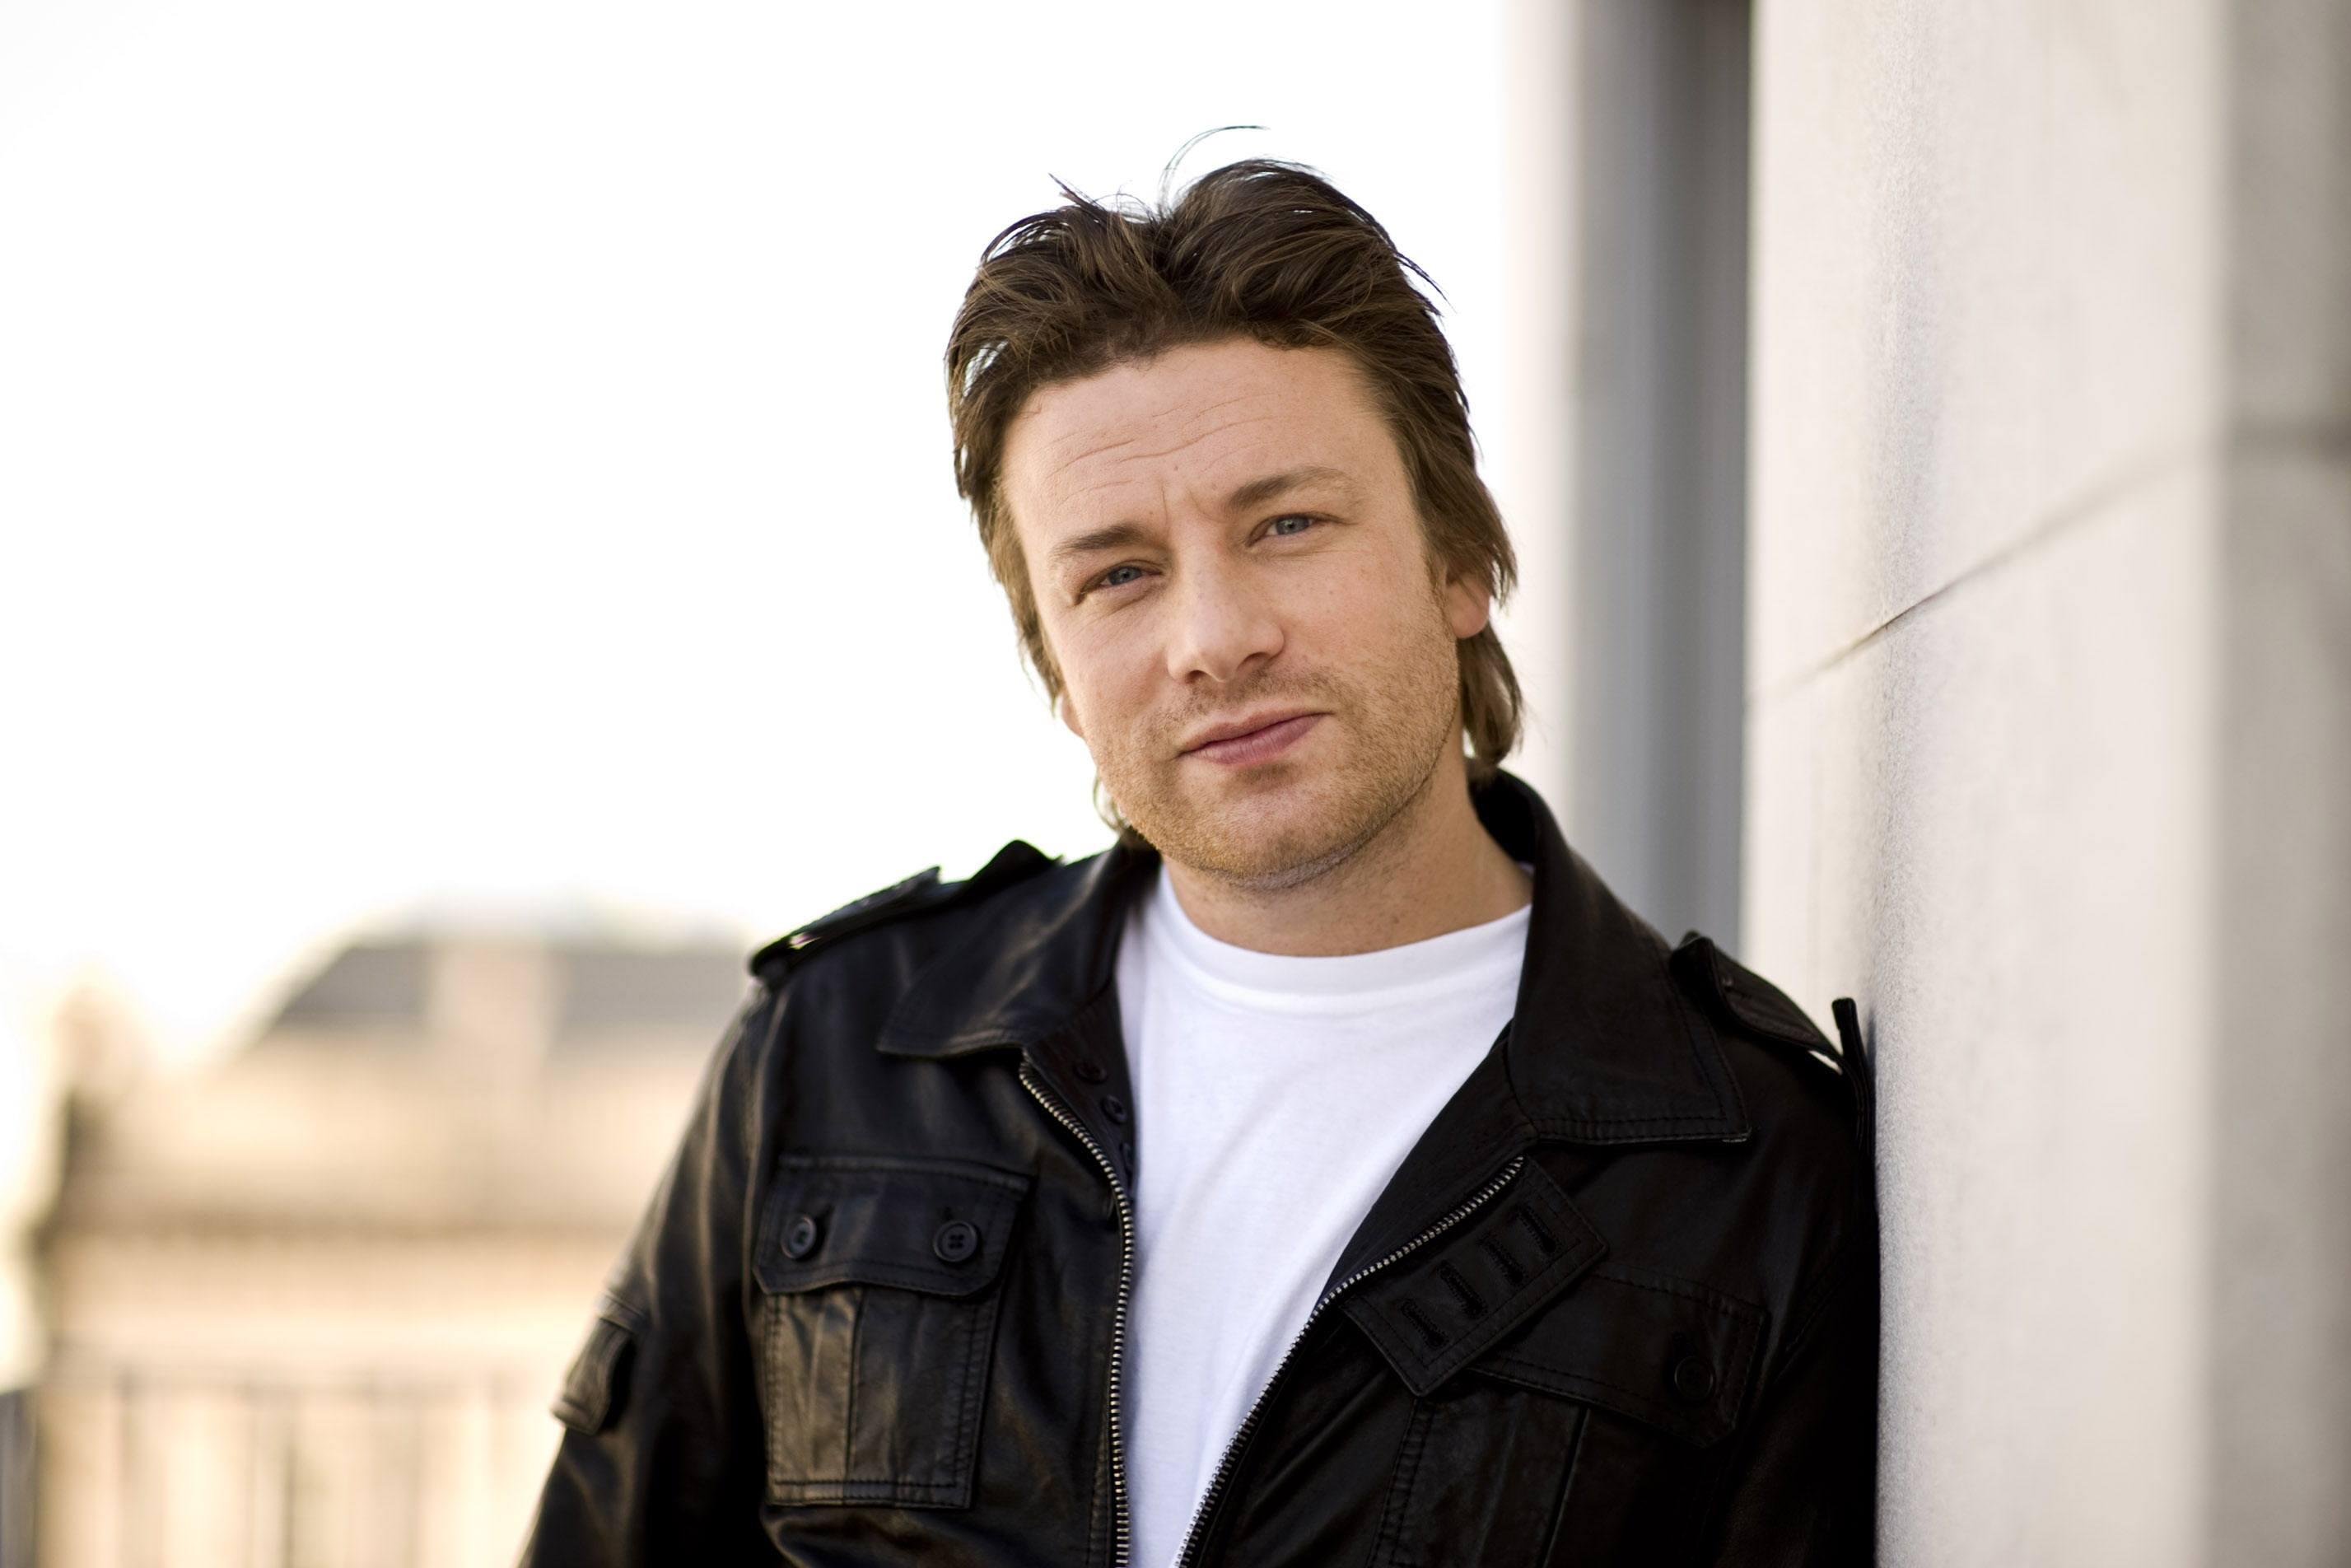 British celebrity Chef Jamie Oliver poses